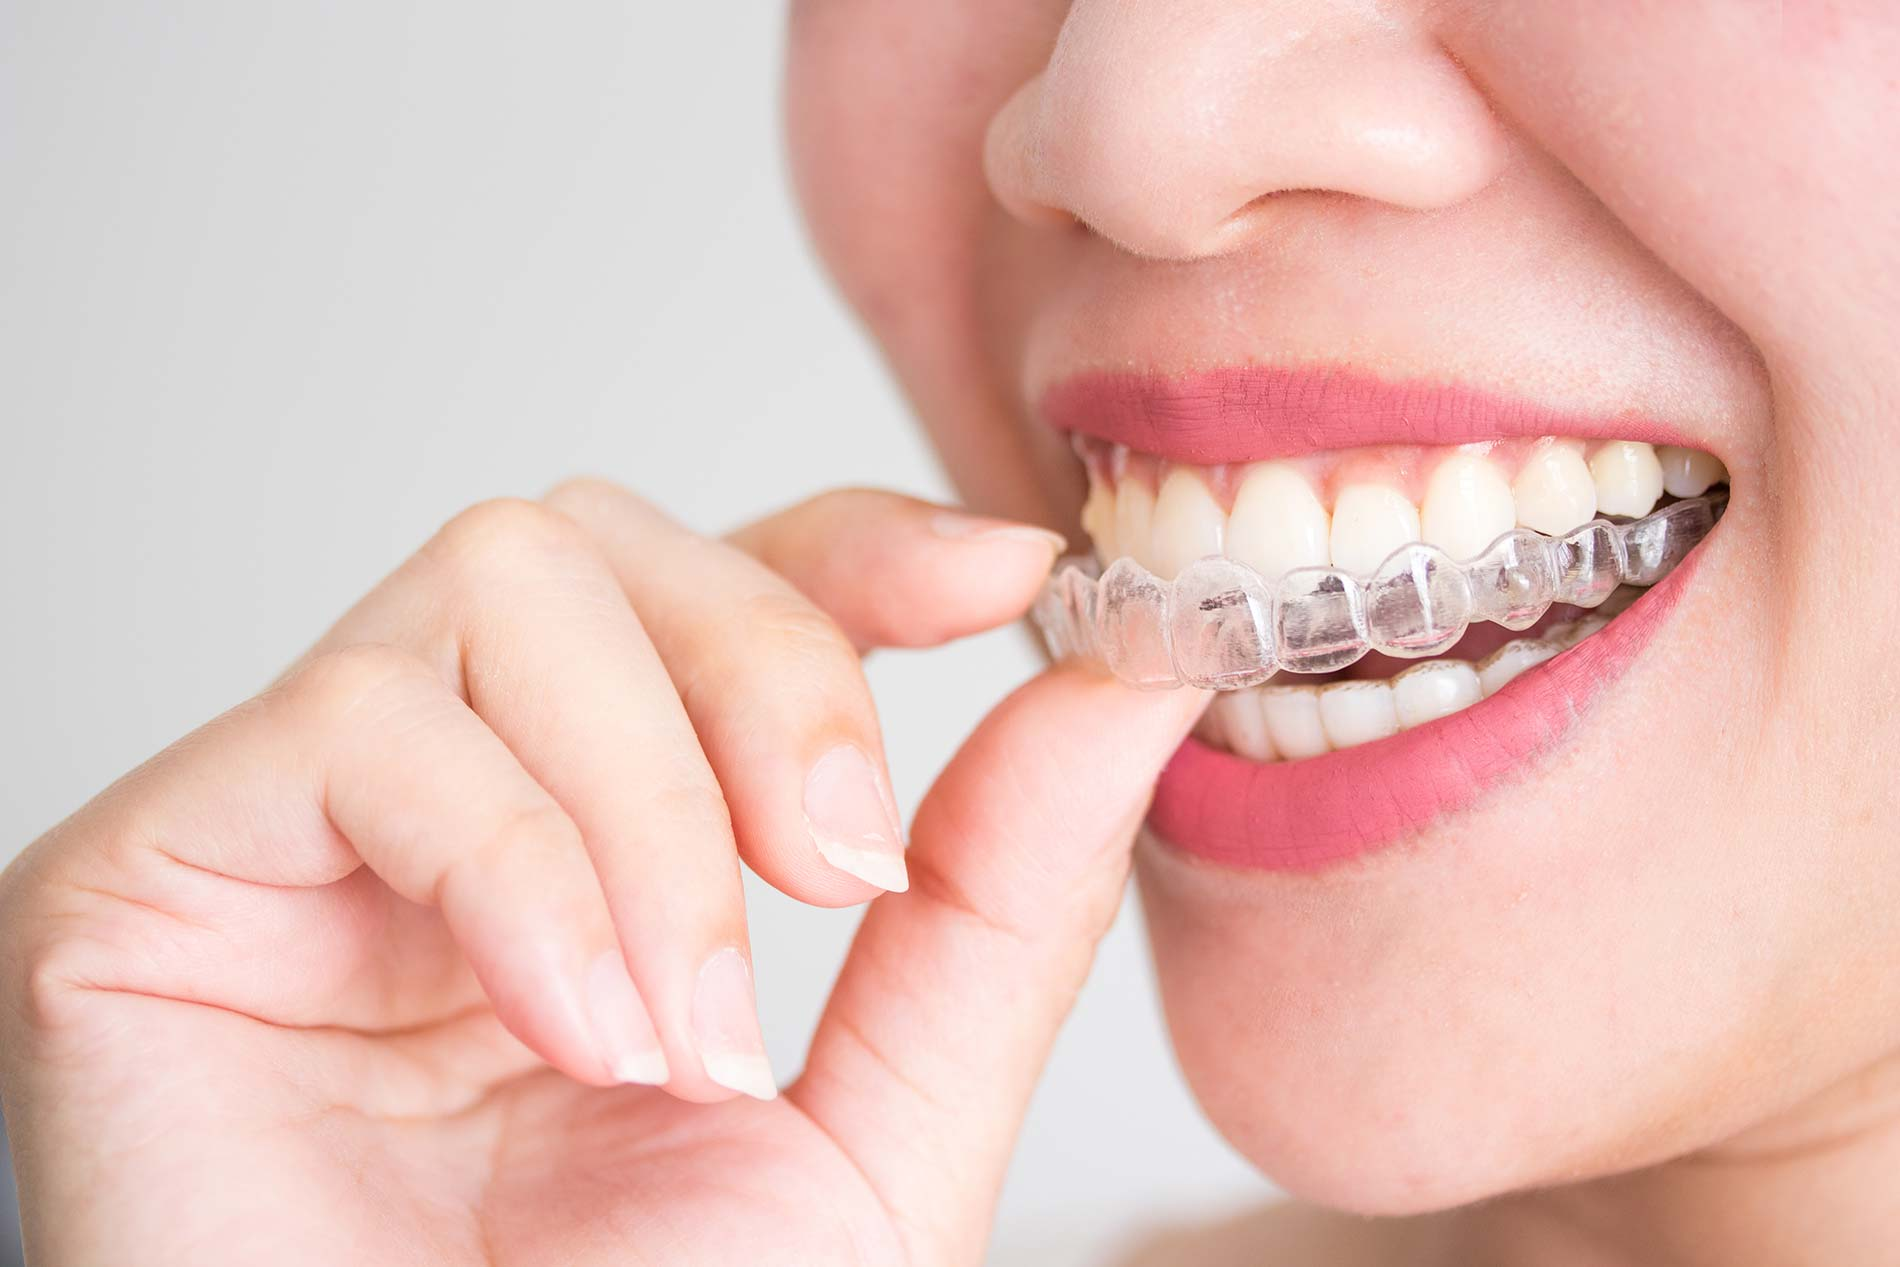 invisalign and teeth straightening